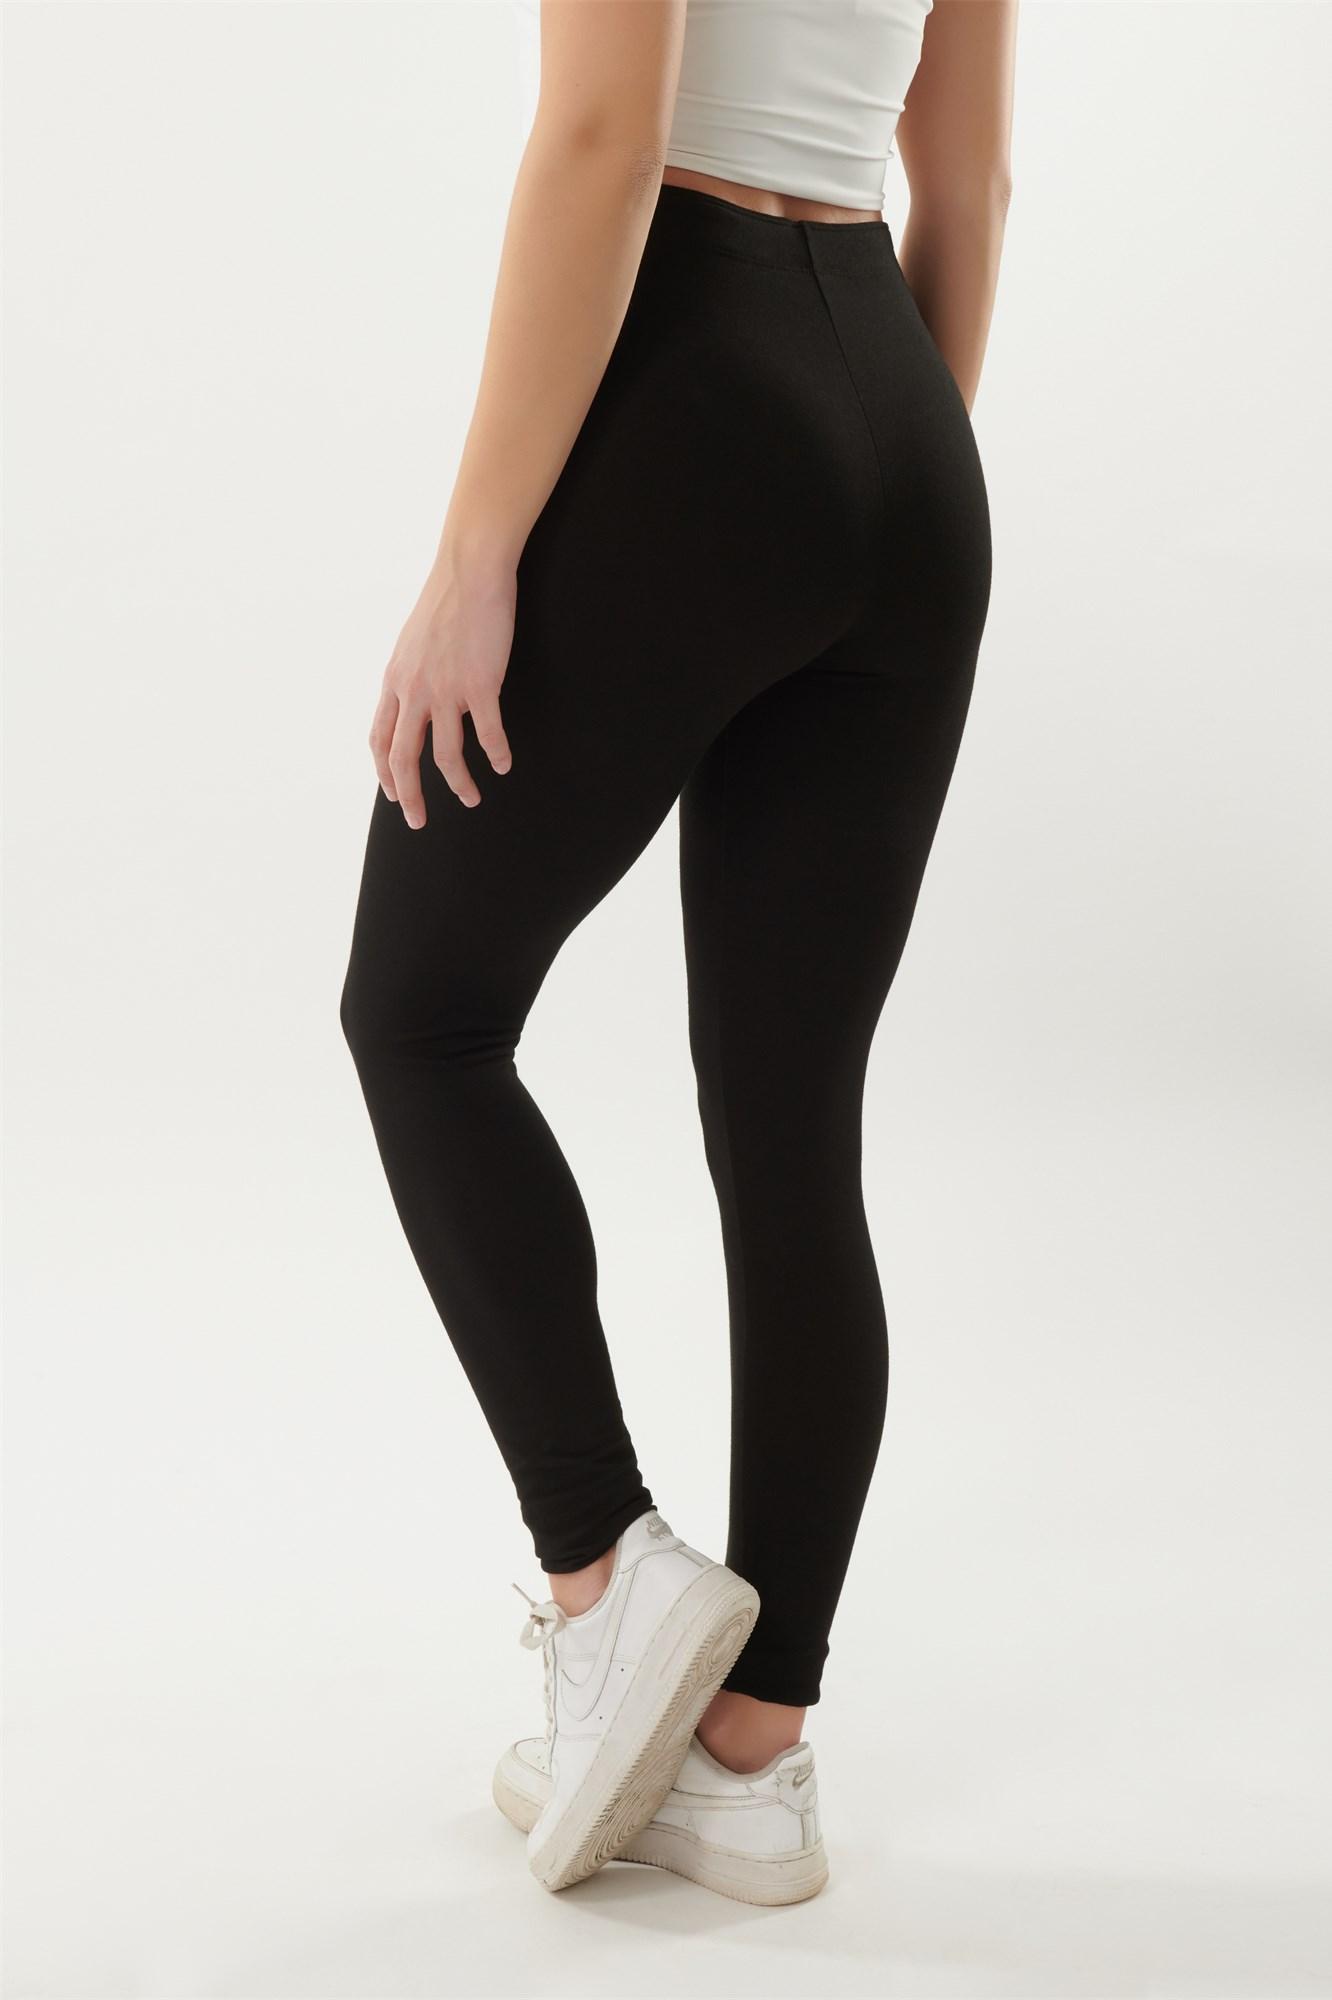 Image 3 of High Rise Super Soft Legging